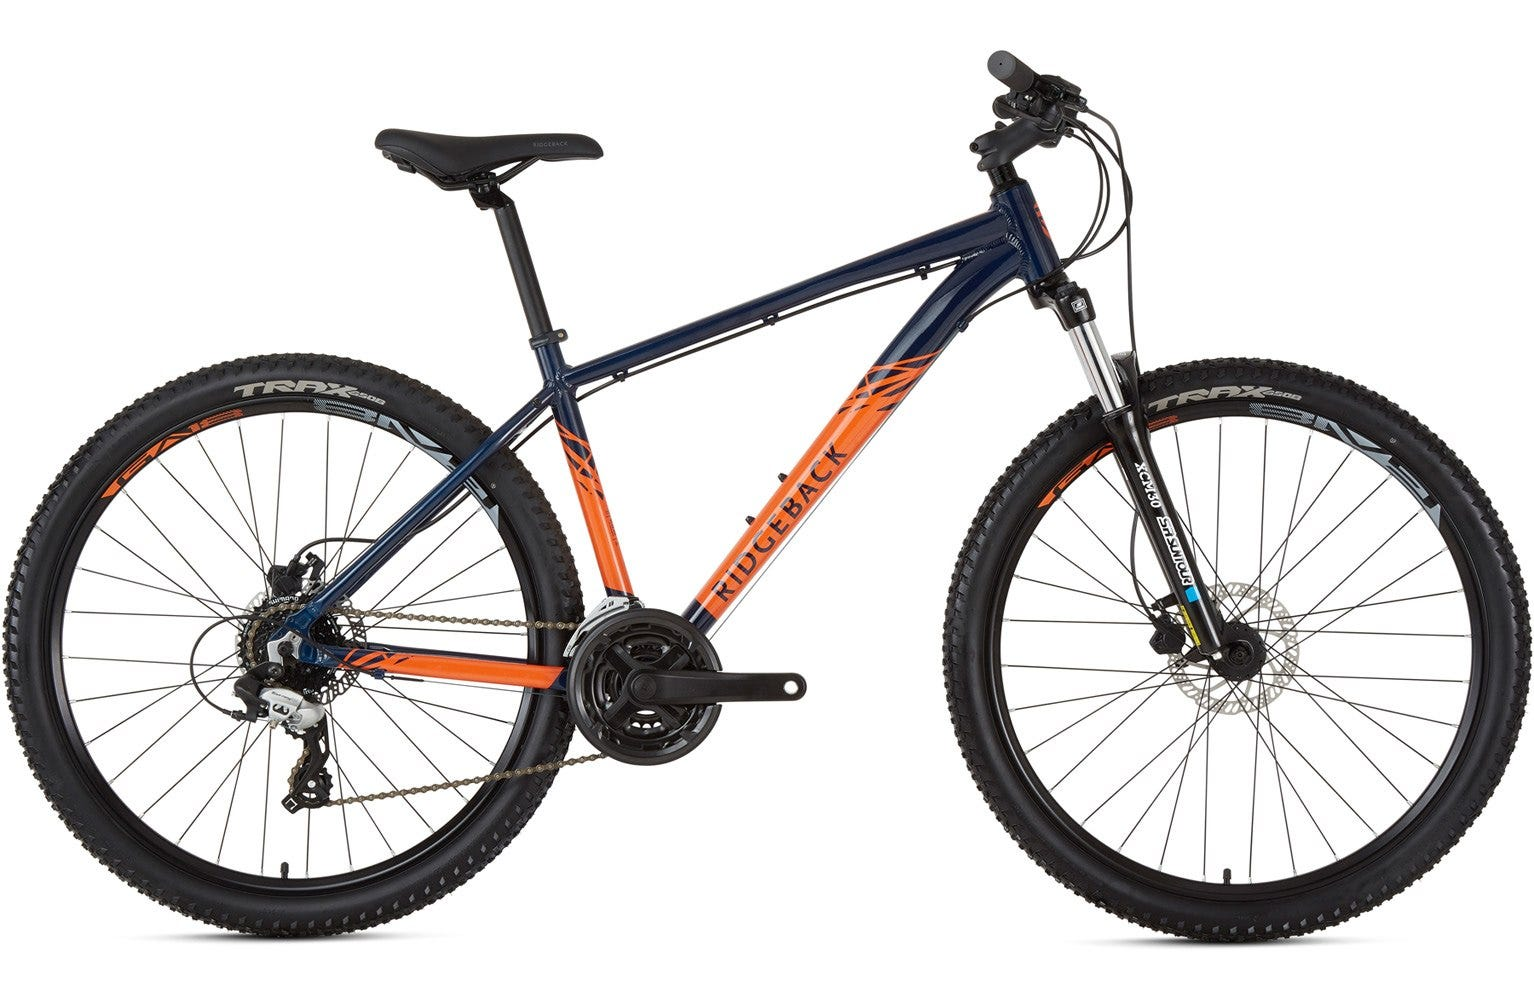 Ridgeback 2020 Terrain 4 Sm Ex Display Bike